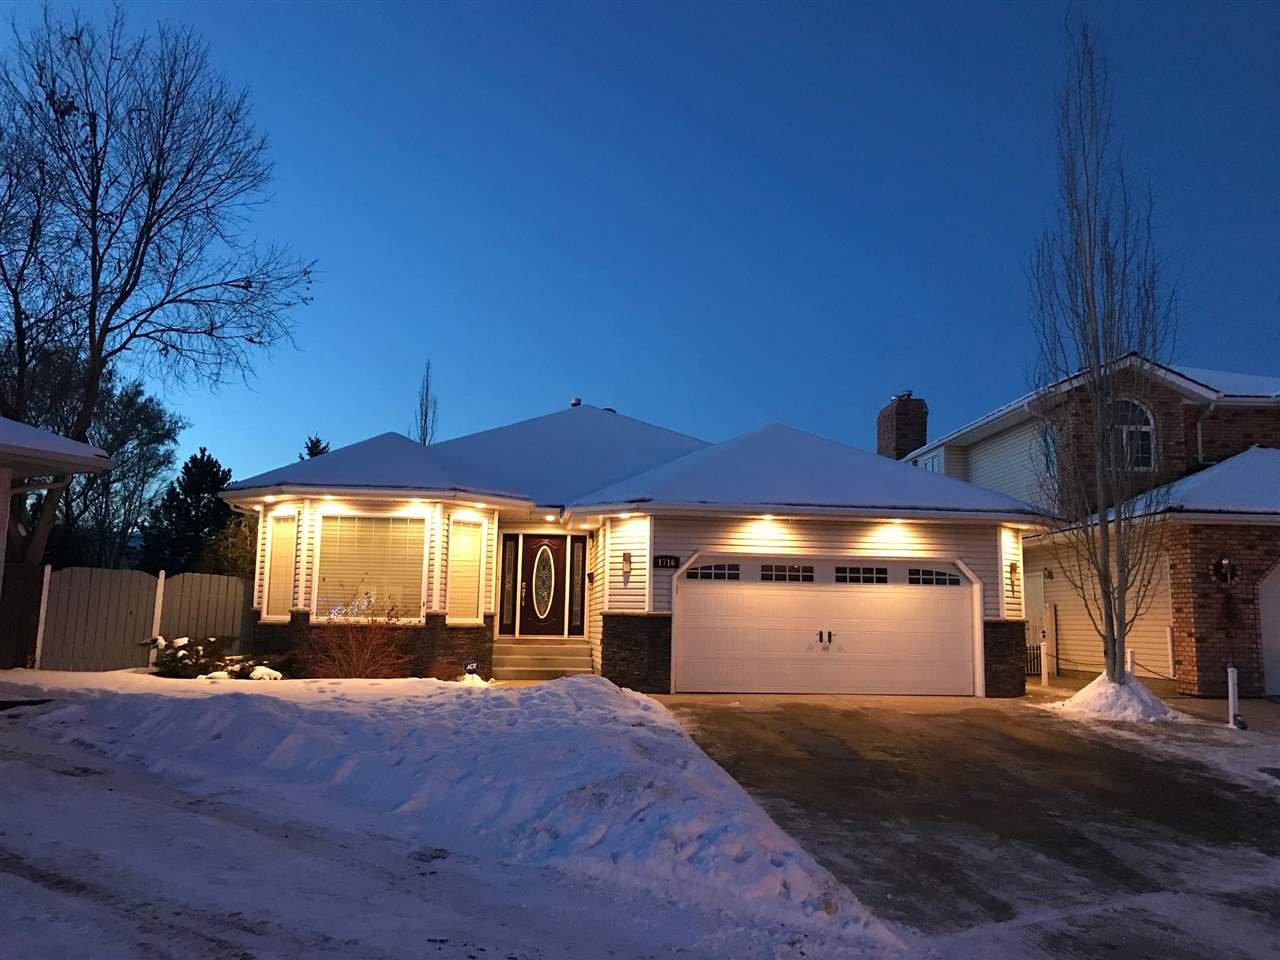 Main Photo: 1716 BEARSPAW Drive E in Edmonton: Zone 16 House for sale : MLS®# E4182661